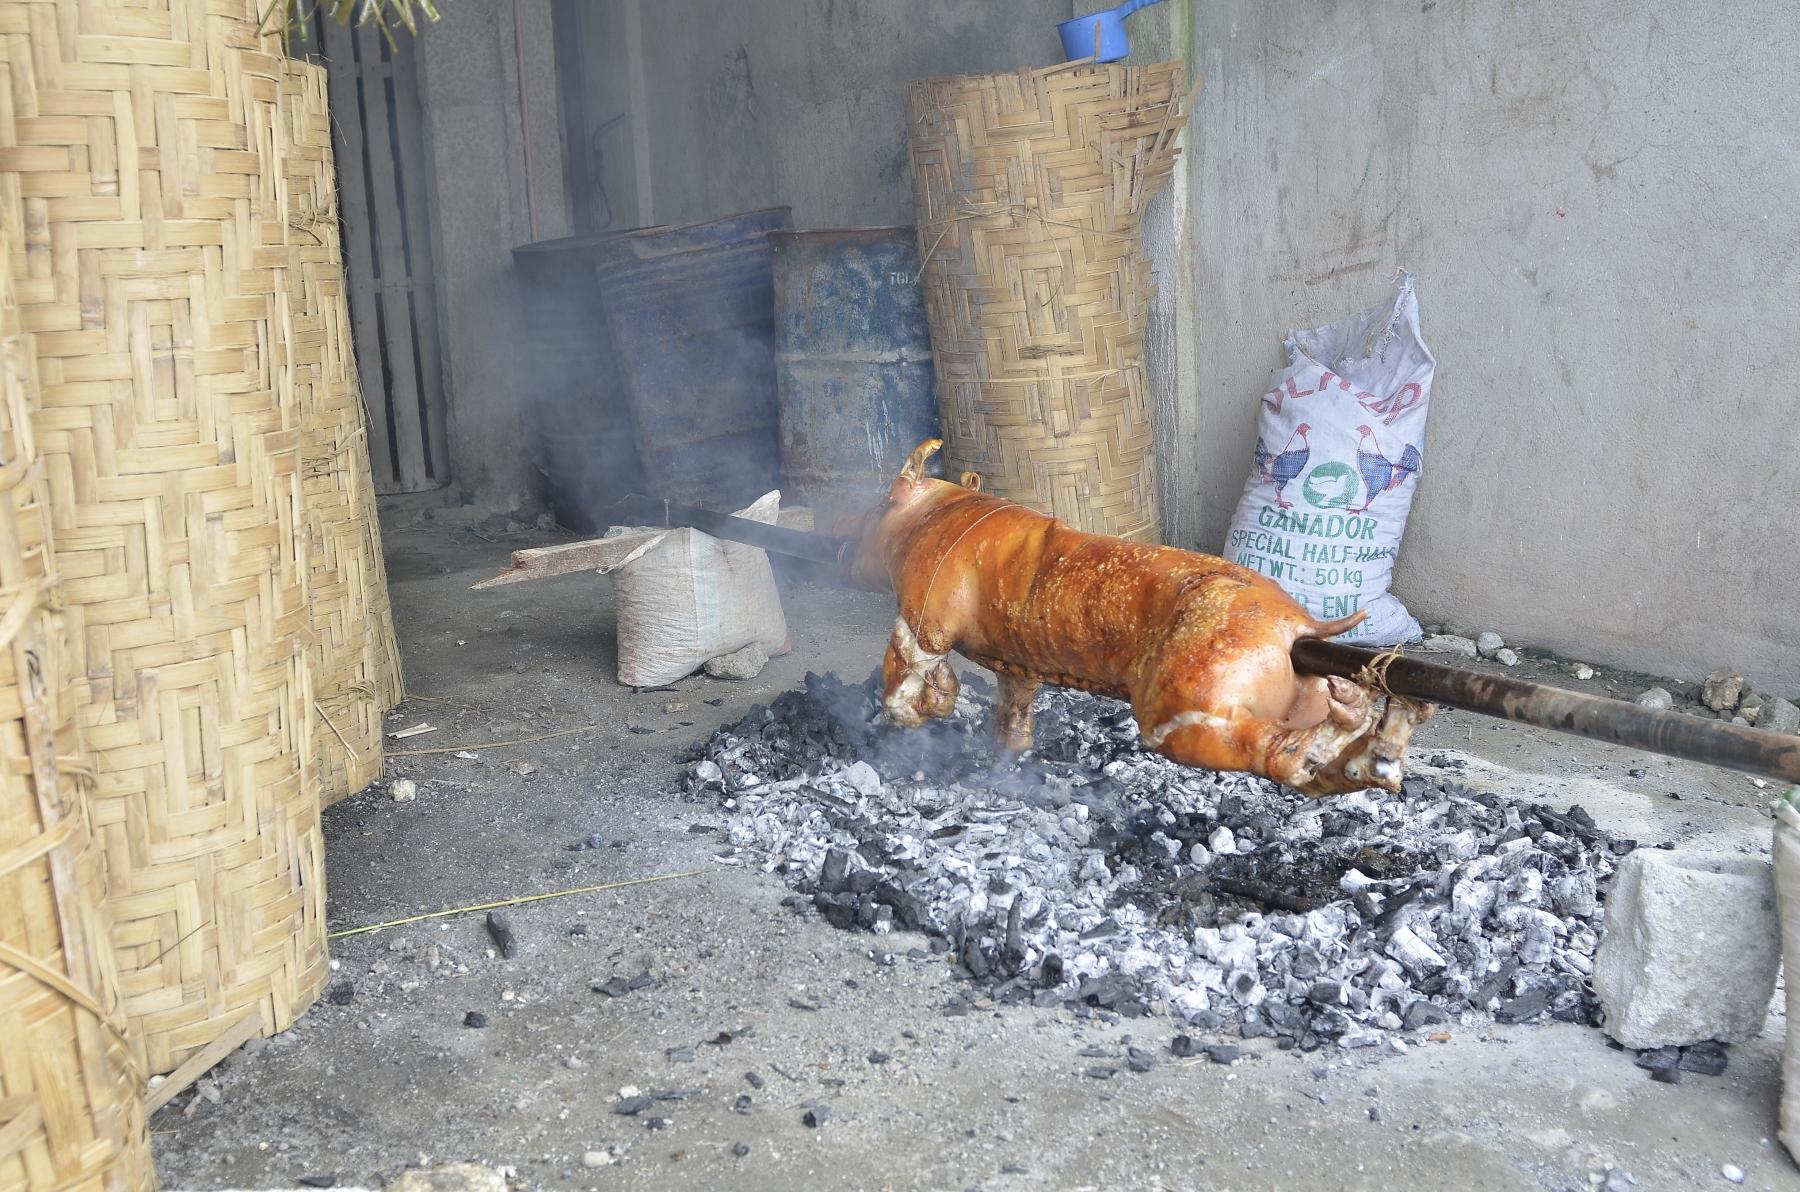 Malapascua_Phillipines_23072011_0205